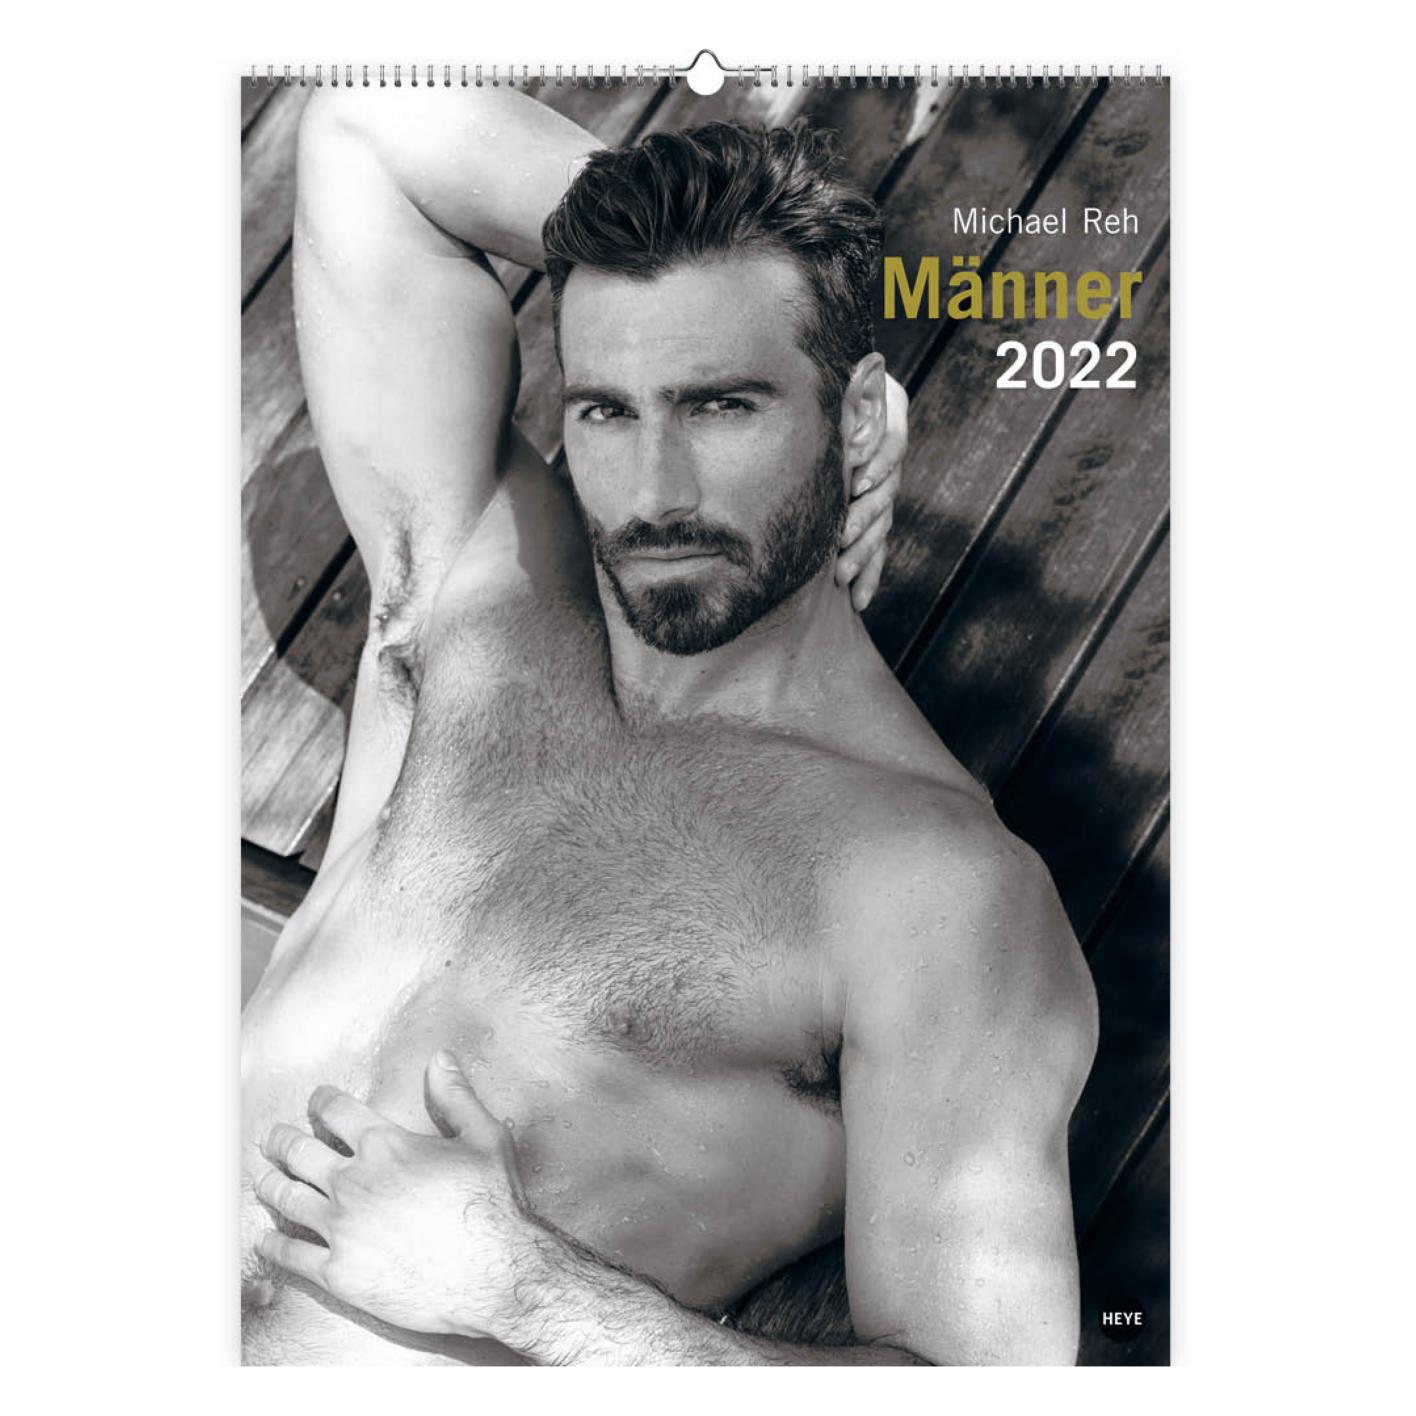 Kalender - 2022 - Mannen - Michael Reh - 49x68cm - in Kalenders